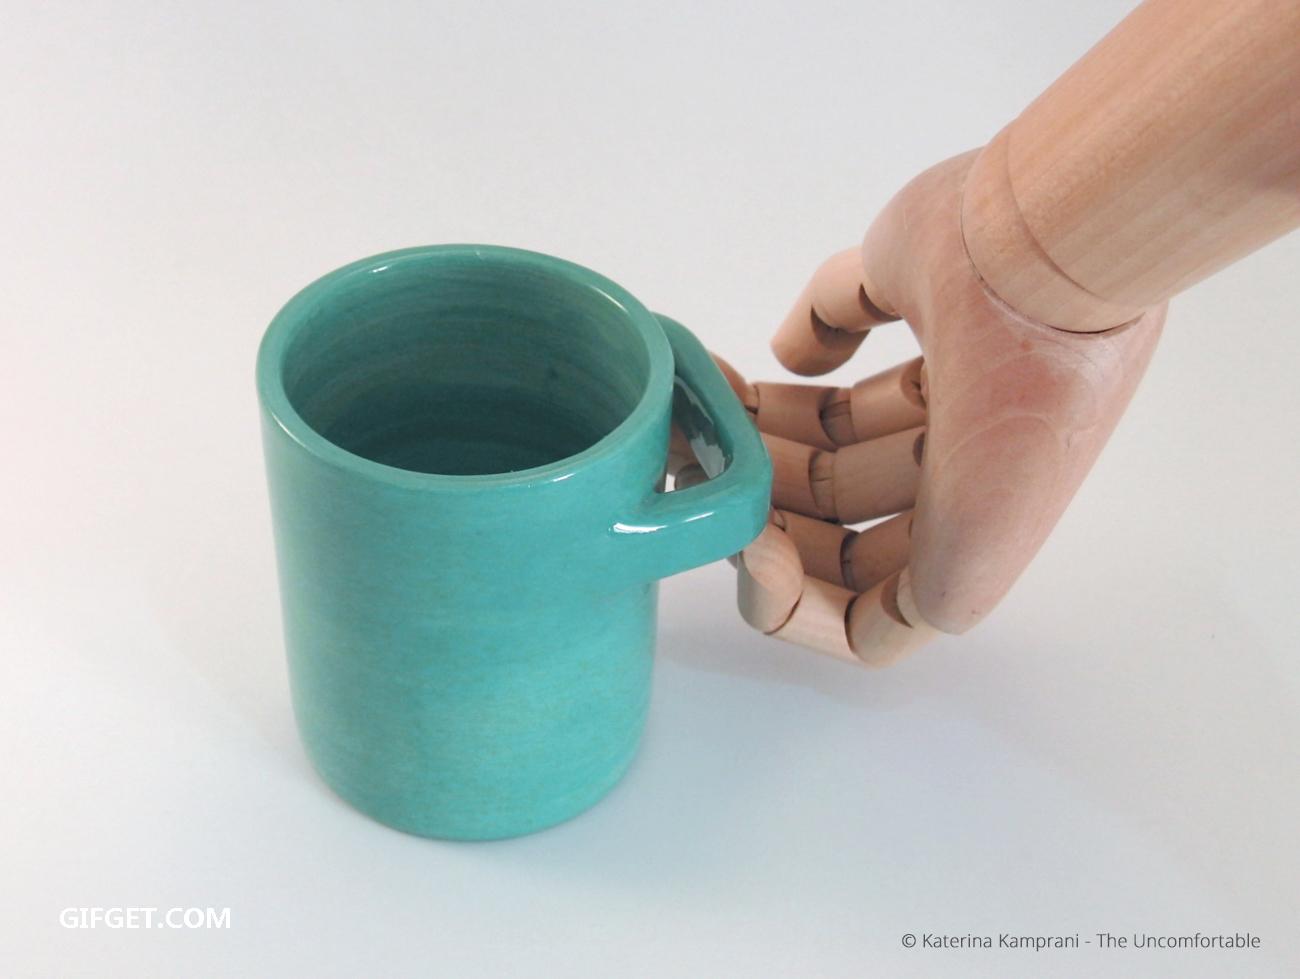 【The Uncomfortable】建筑师Katerina专门设计反人类的用具 简直是国外版的手工耿 趣事儿 第5张